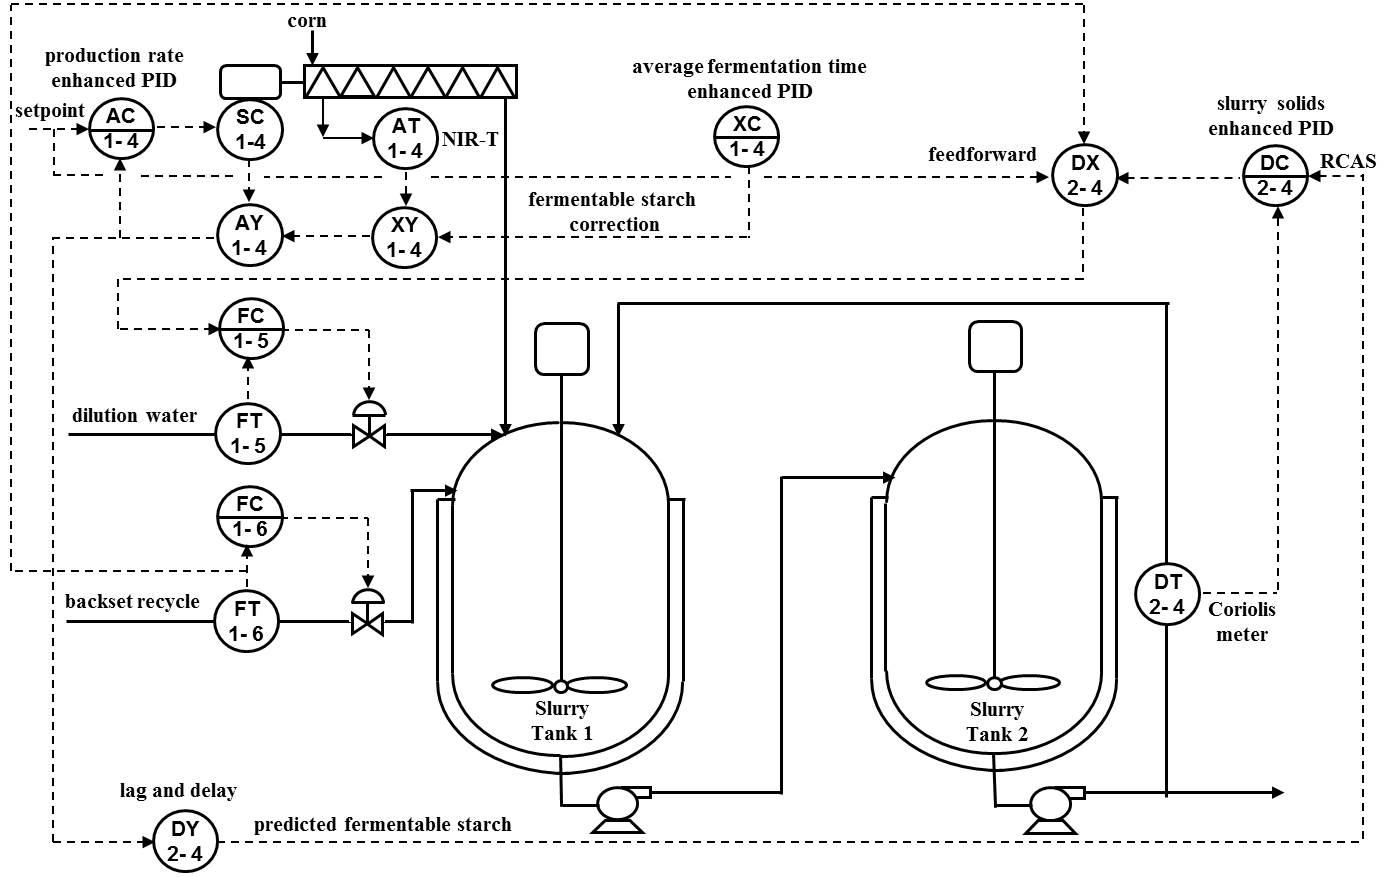 ISA-Interchange-Insights-Optimizing-Ethanol-Plants-Rev0